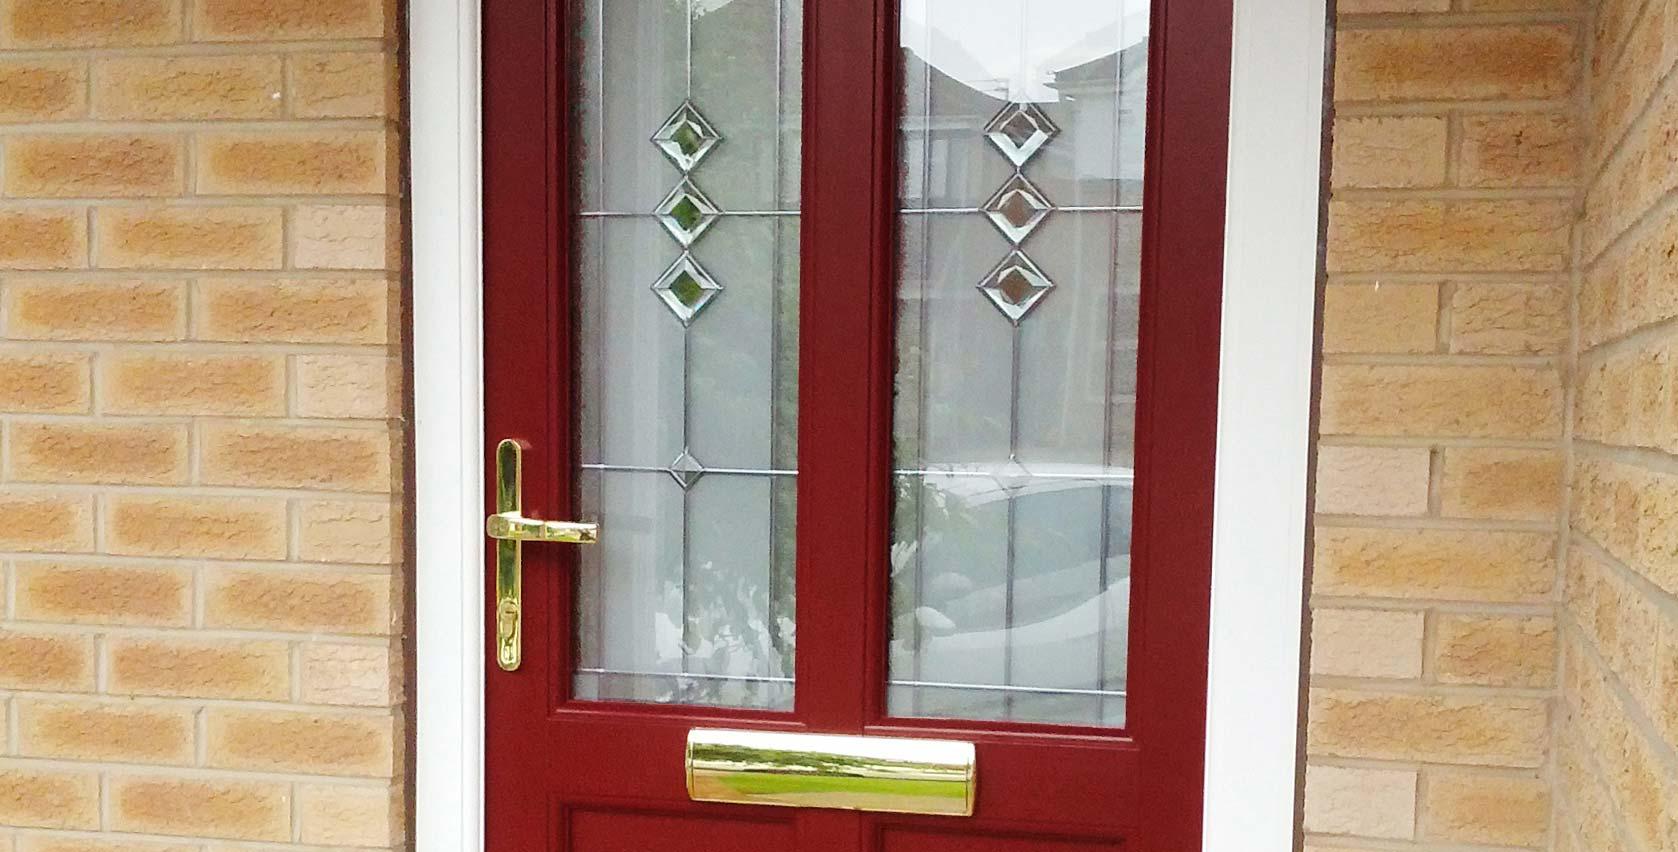 Suffolk Door Collection The Sudbury & Suffolk Door Collection - Express Your Personality - PVC-u Doors